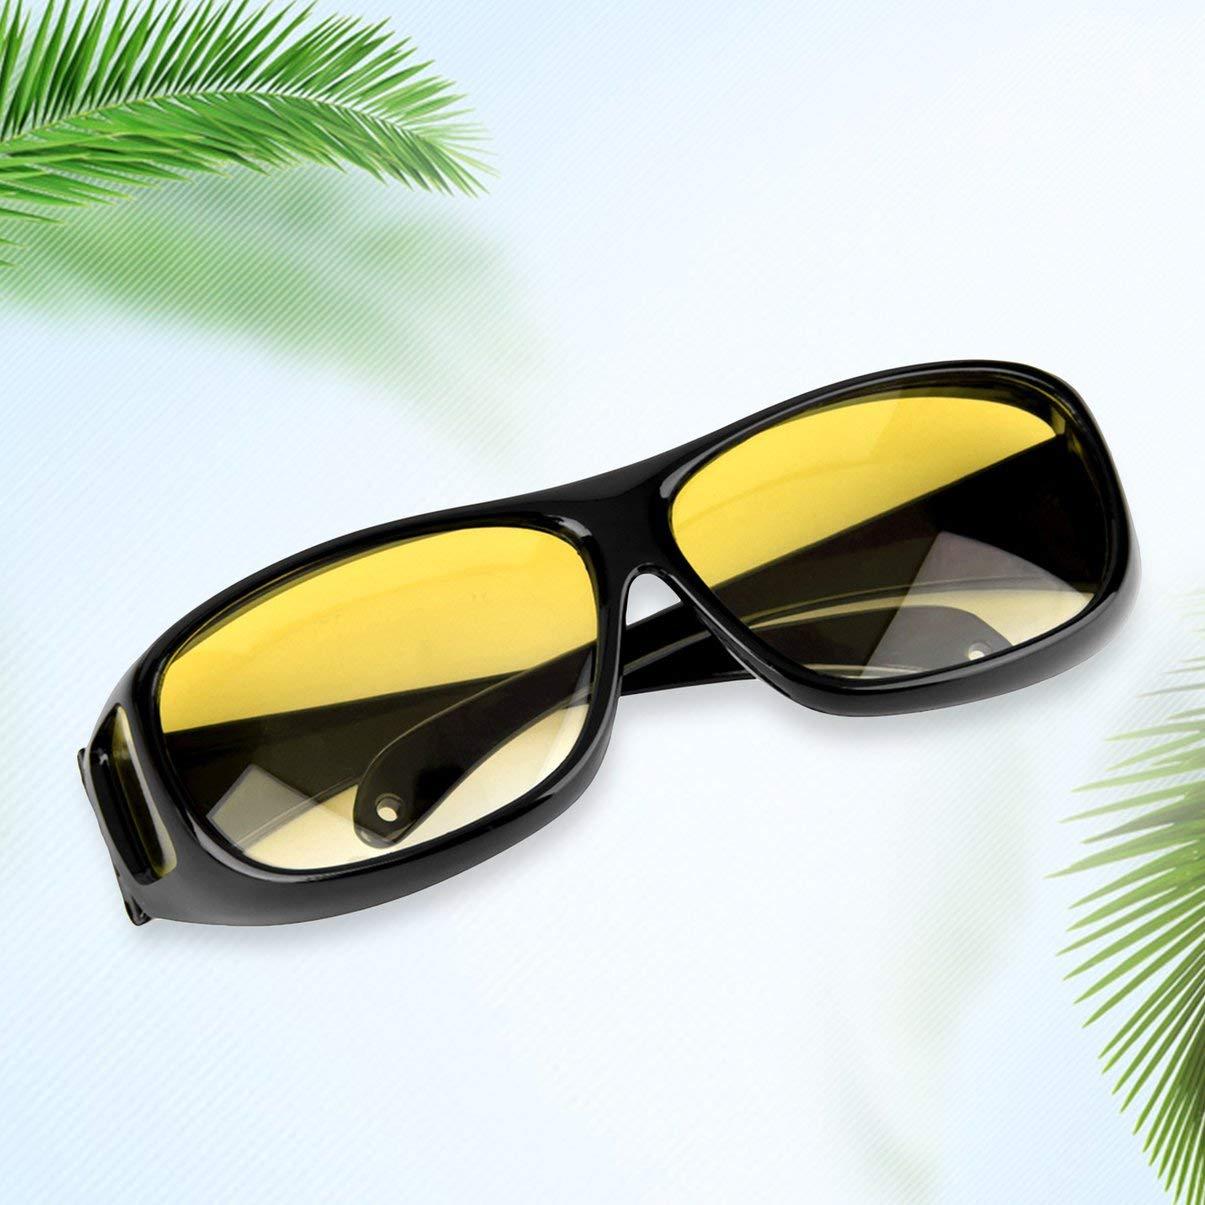 FHJZXDGHNXFGH-UK Man Woman Night Driving Glasses Driver Safety Sunglasses UV 400 Eye Protecting Glasses Goggles Anti Glaring Vision